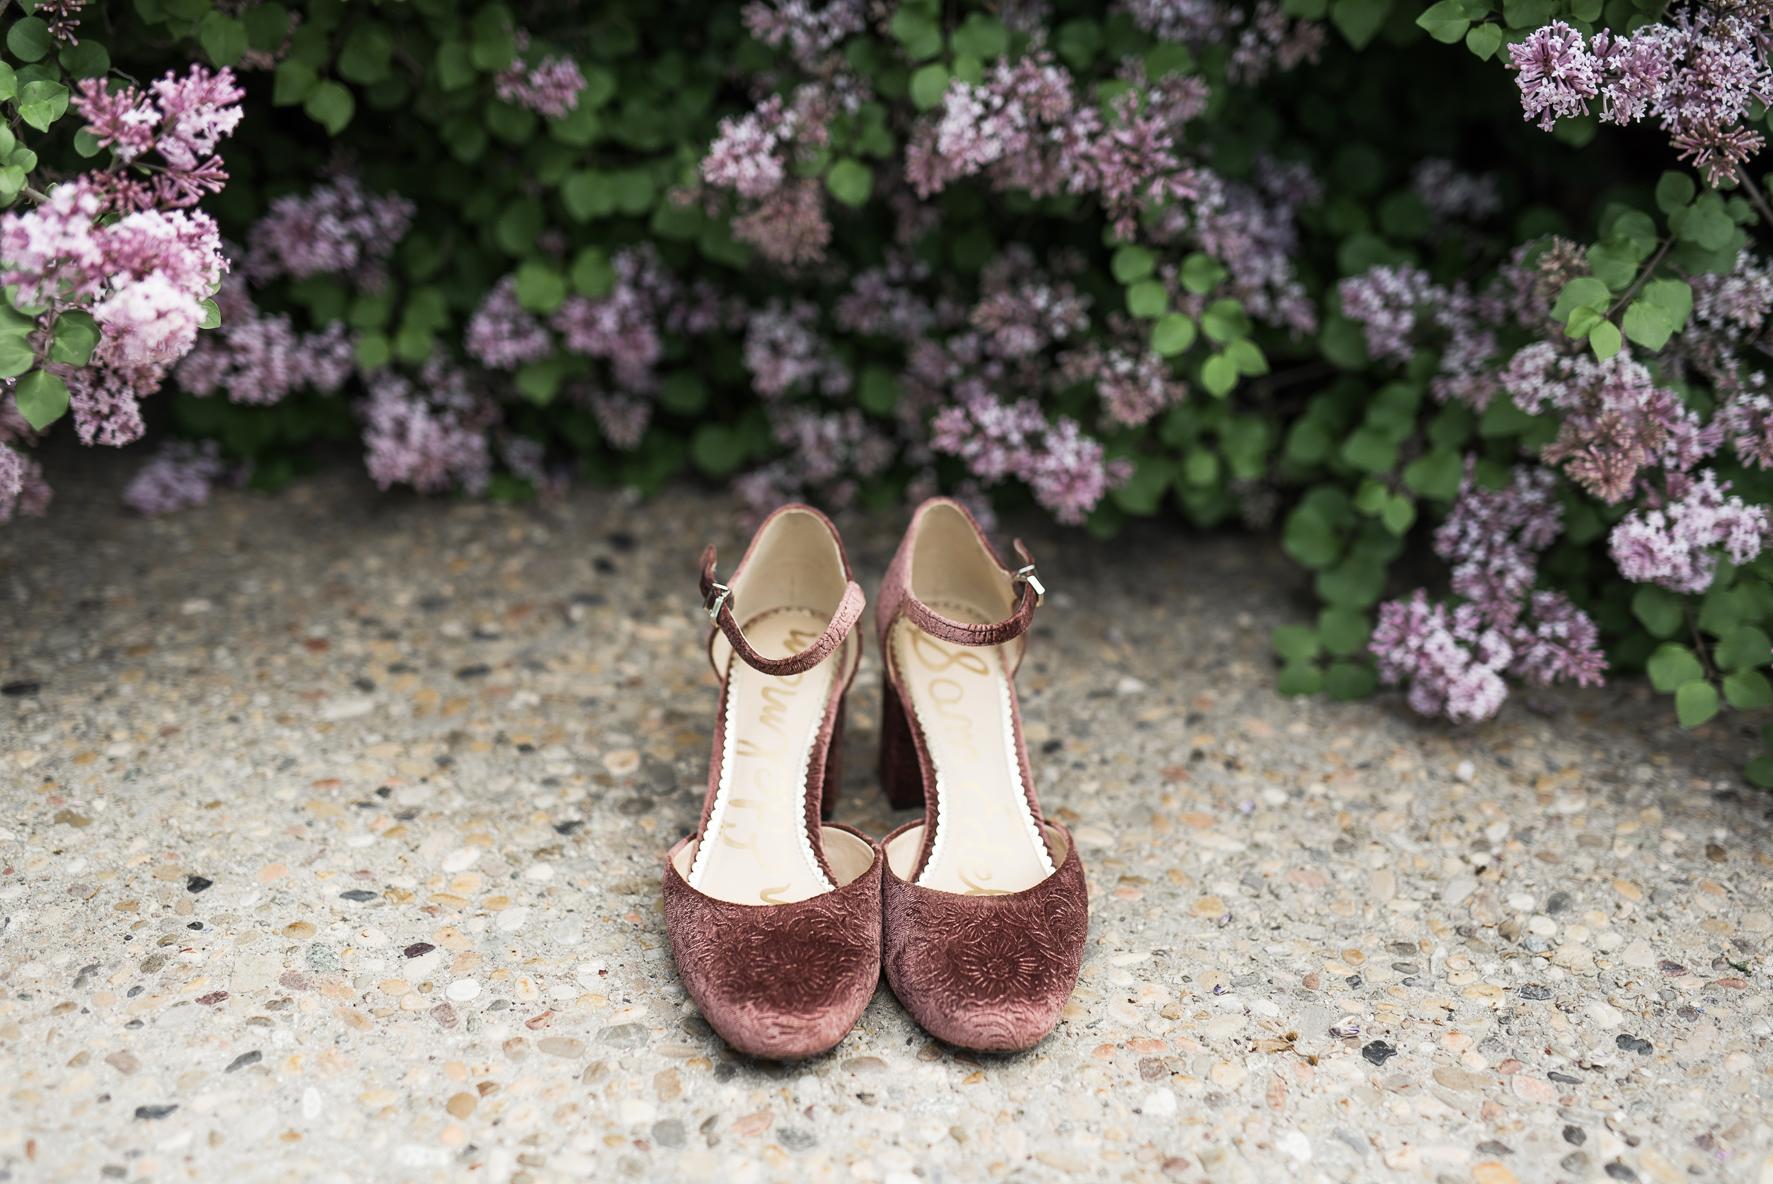 Pink velvet shoes at Red Butte Gardens | Elisha Braithwaite Photography